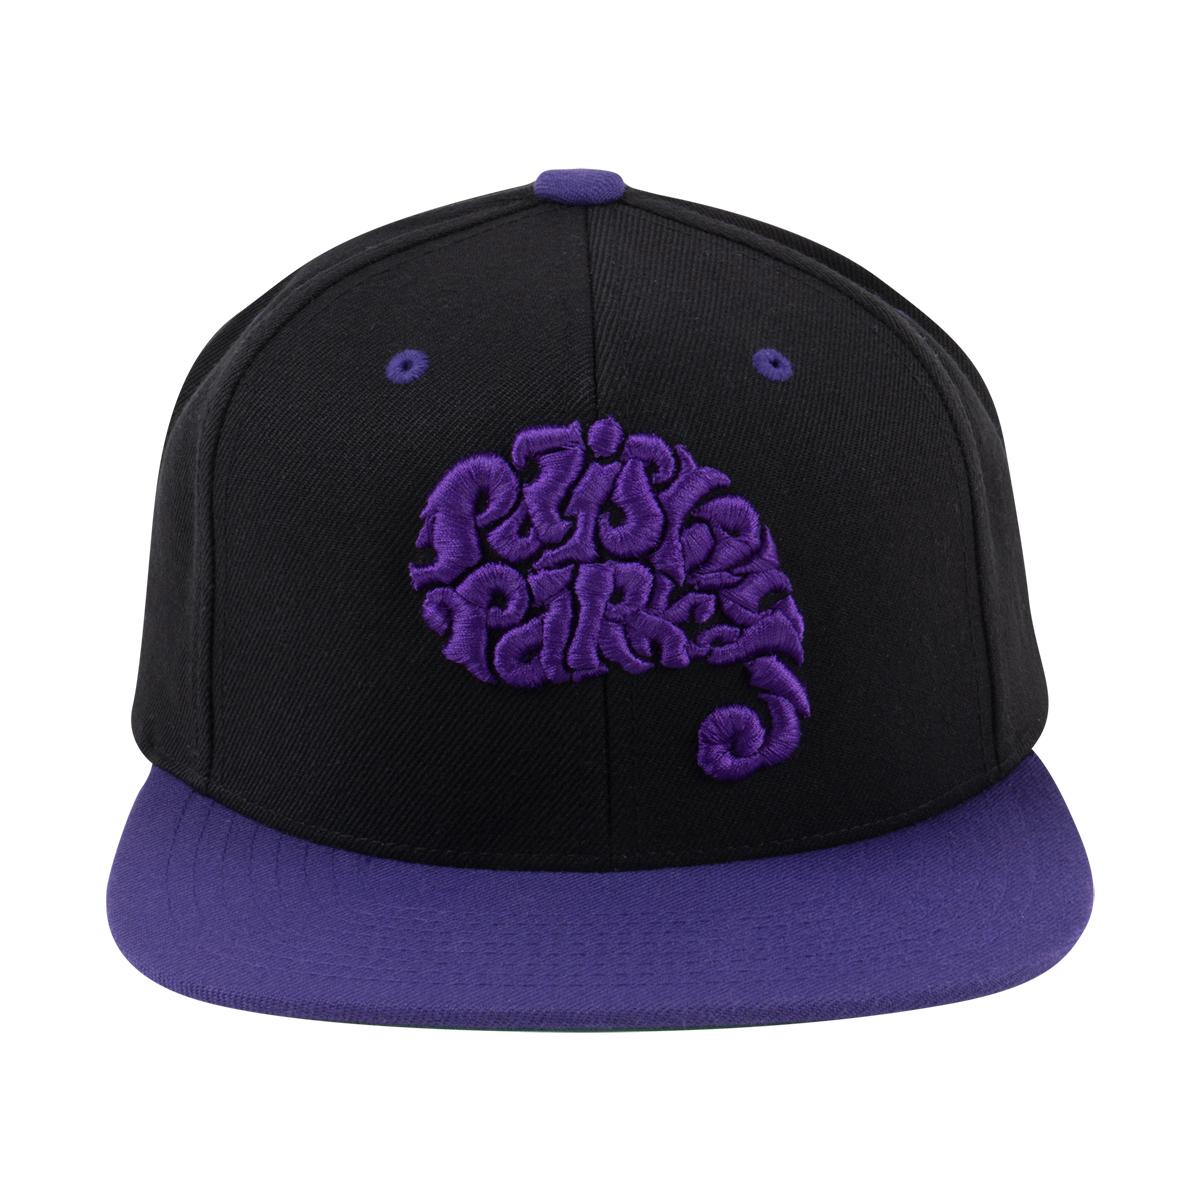 Paisley Park Logo Snapback Hat (Black and Purple)